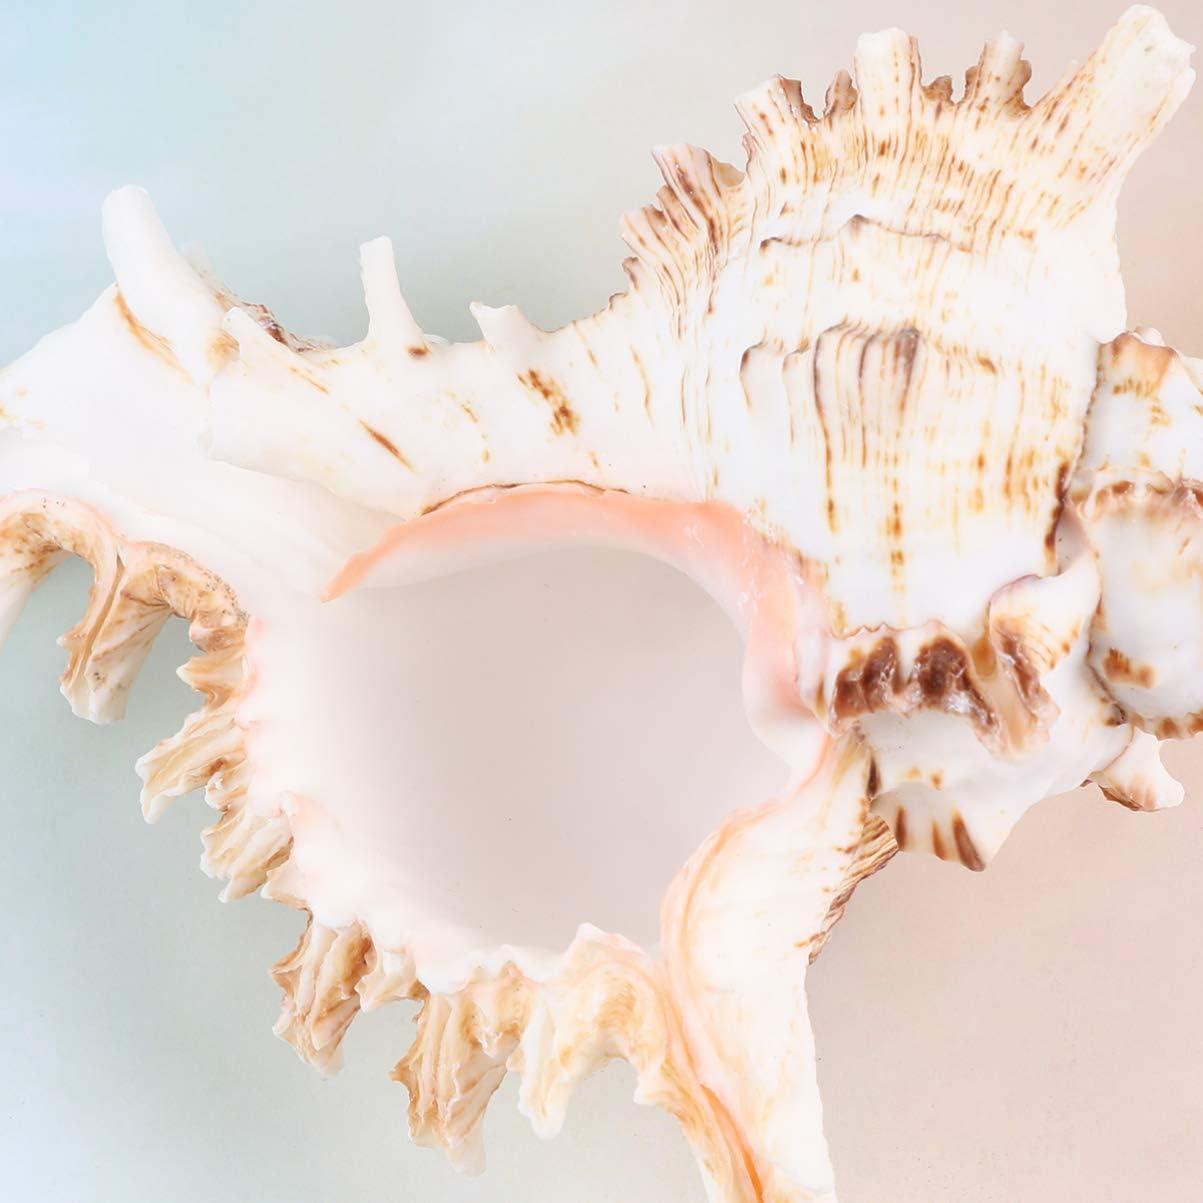 LIOOBO Concha de Mar Natural Concha de Mar Concha para Decoraci/ón de Boda Fiesta Tem/ática de Playa Manualidades DIY Tanque de Peces Acuario Paisaje Ornamento 10-11 Cm